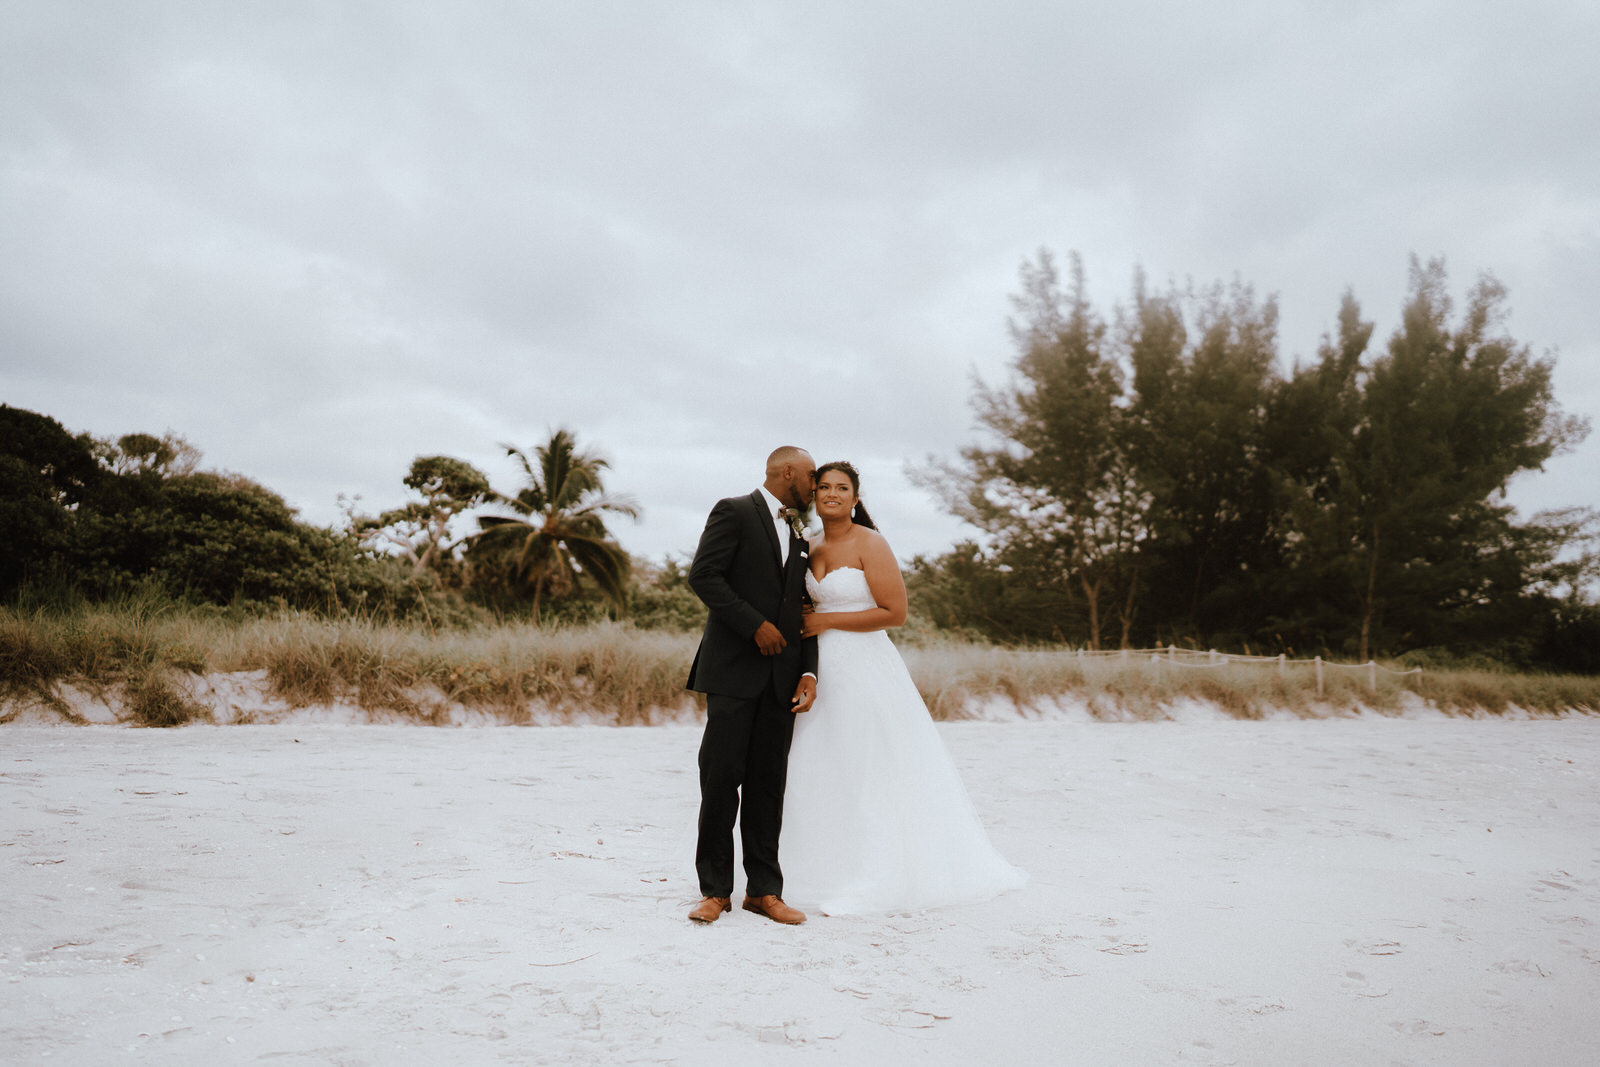 South Seas Island Resort Elopement- Alyana and Shawn- Michelle Gonzalez Photography-212.JPG